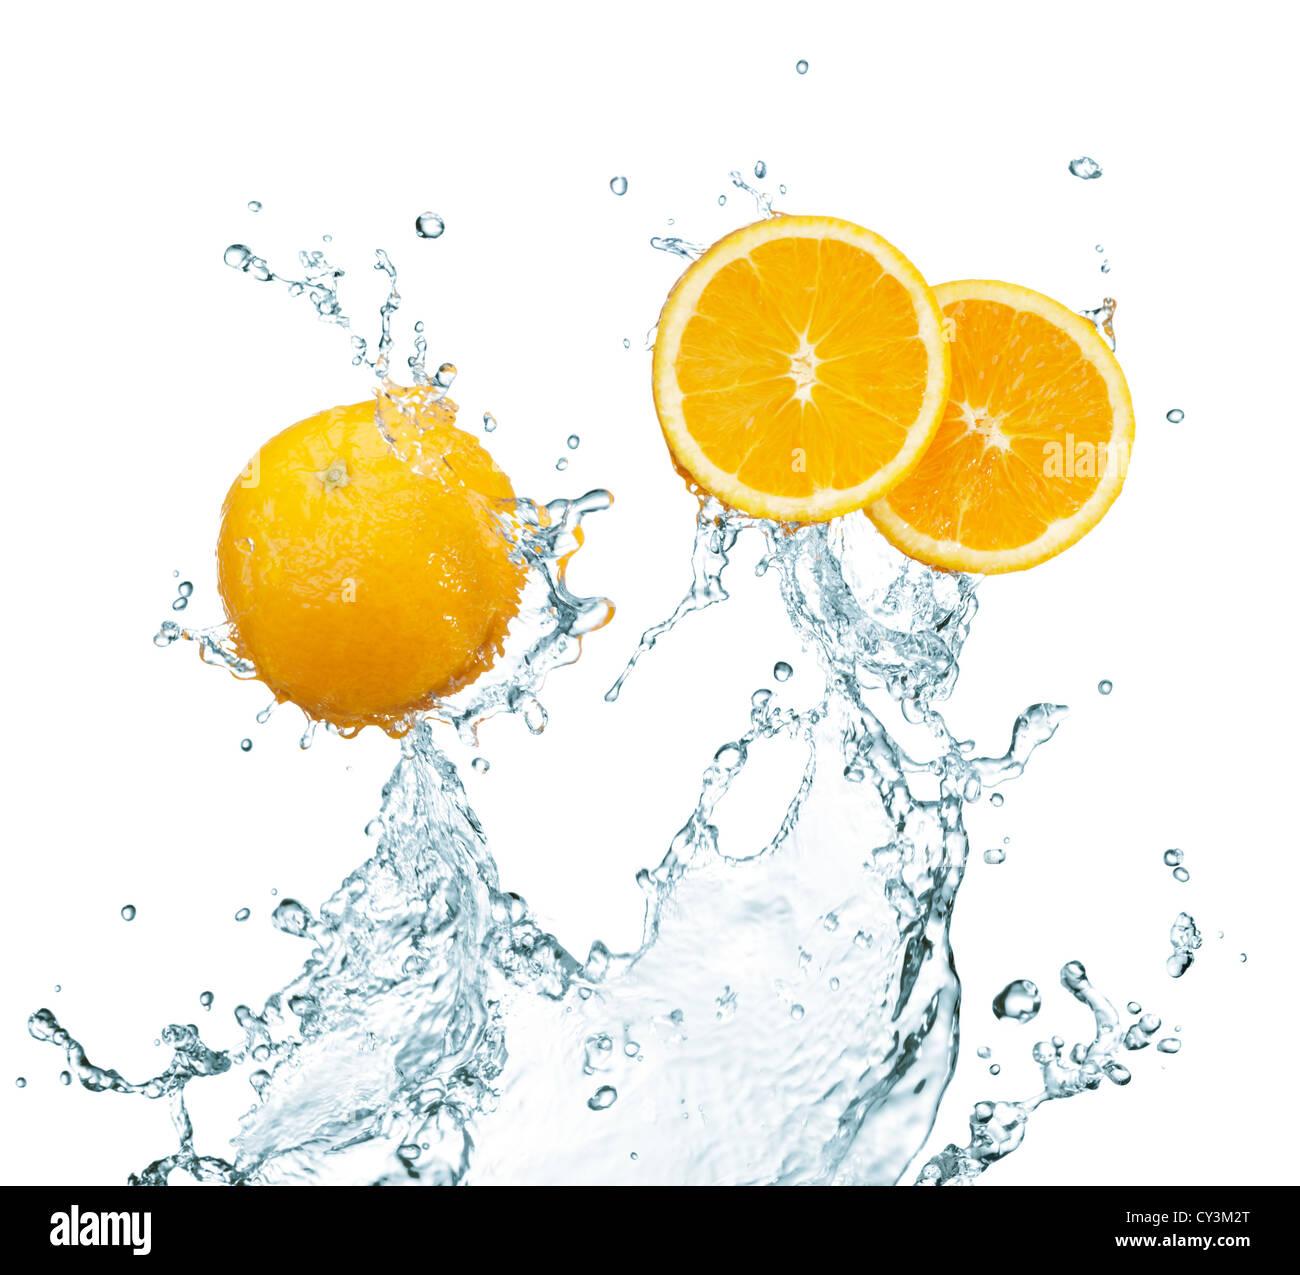 fresh oranges with water splash on white background - Stock Image